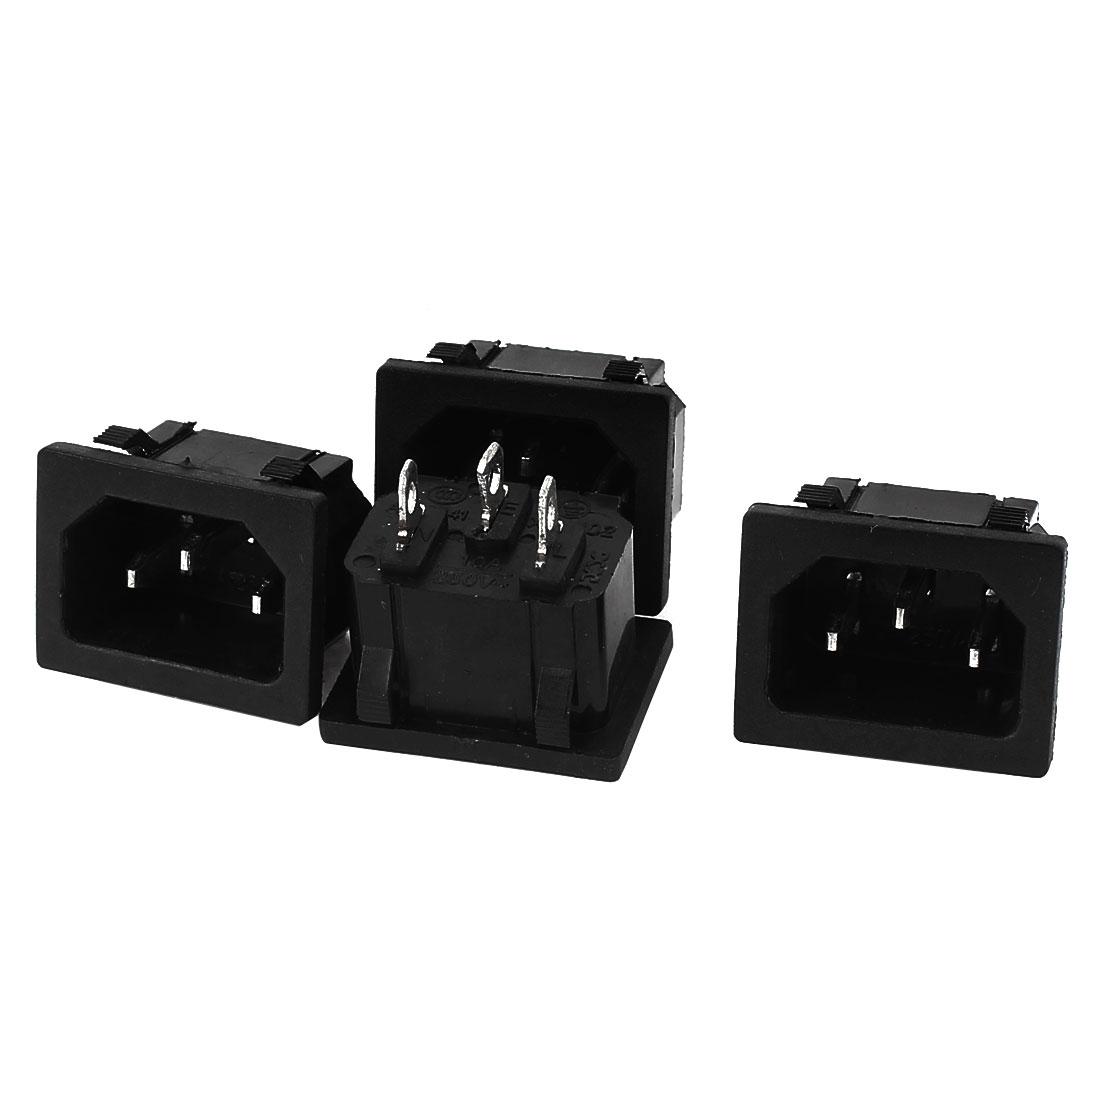 AC 250V 10A 3 Terminal Snap Mount IEC320 C14 Power Socket Adapter 4pcs